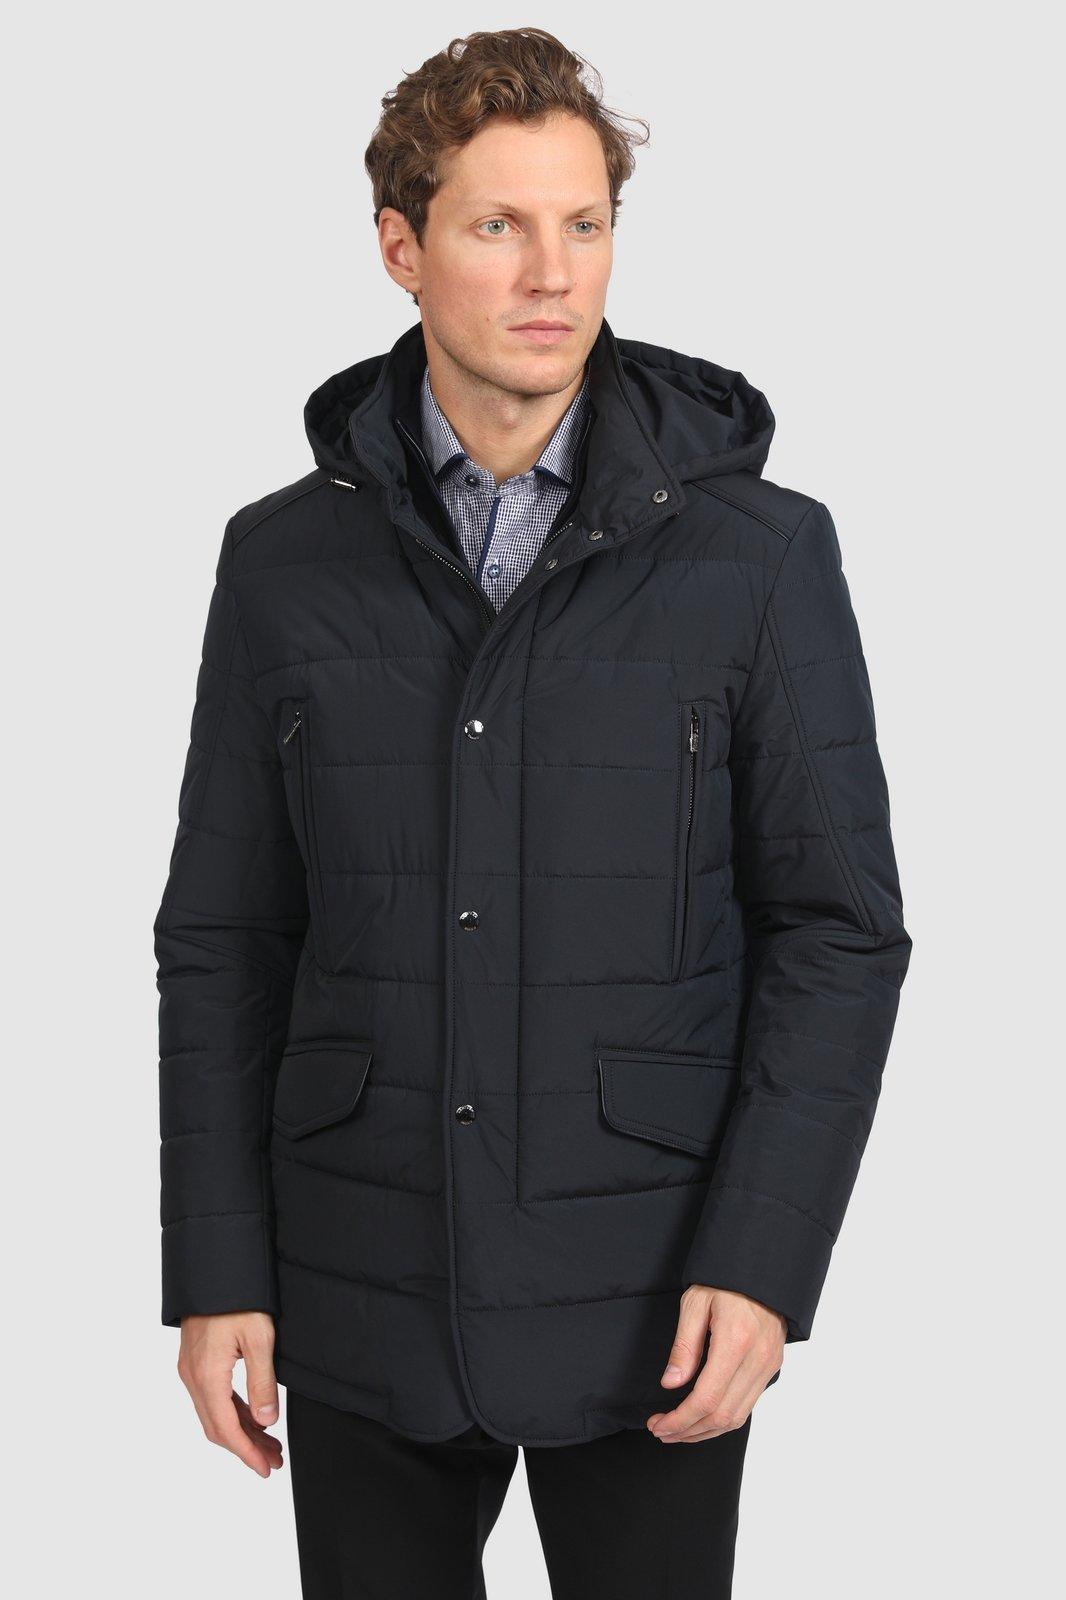 Kanzler Демисезонная куртка KANZLER